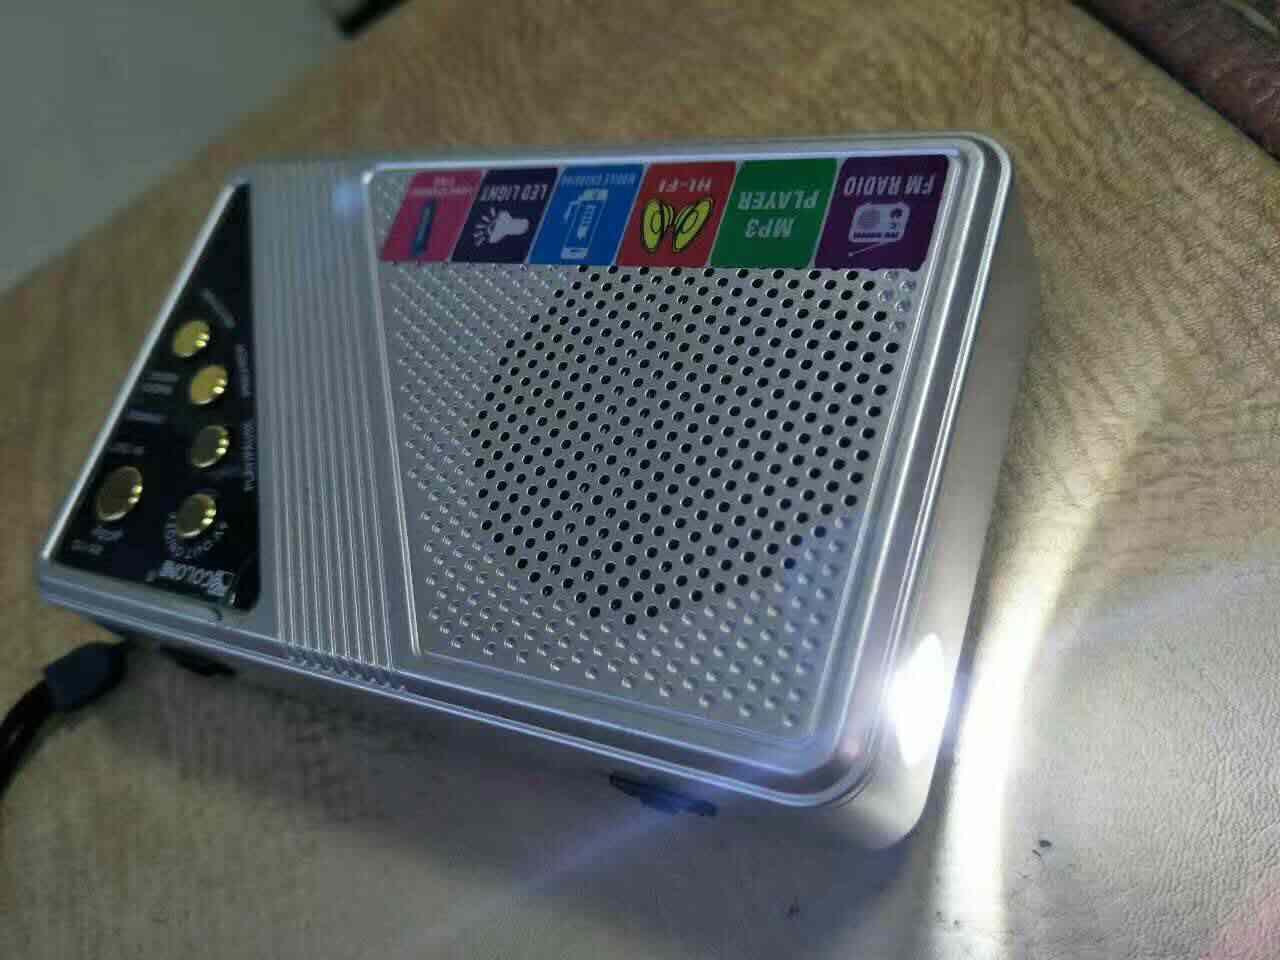 Tradeguide24 com - Radio MP3 music player stocklot 20,000pcs